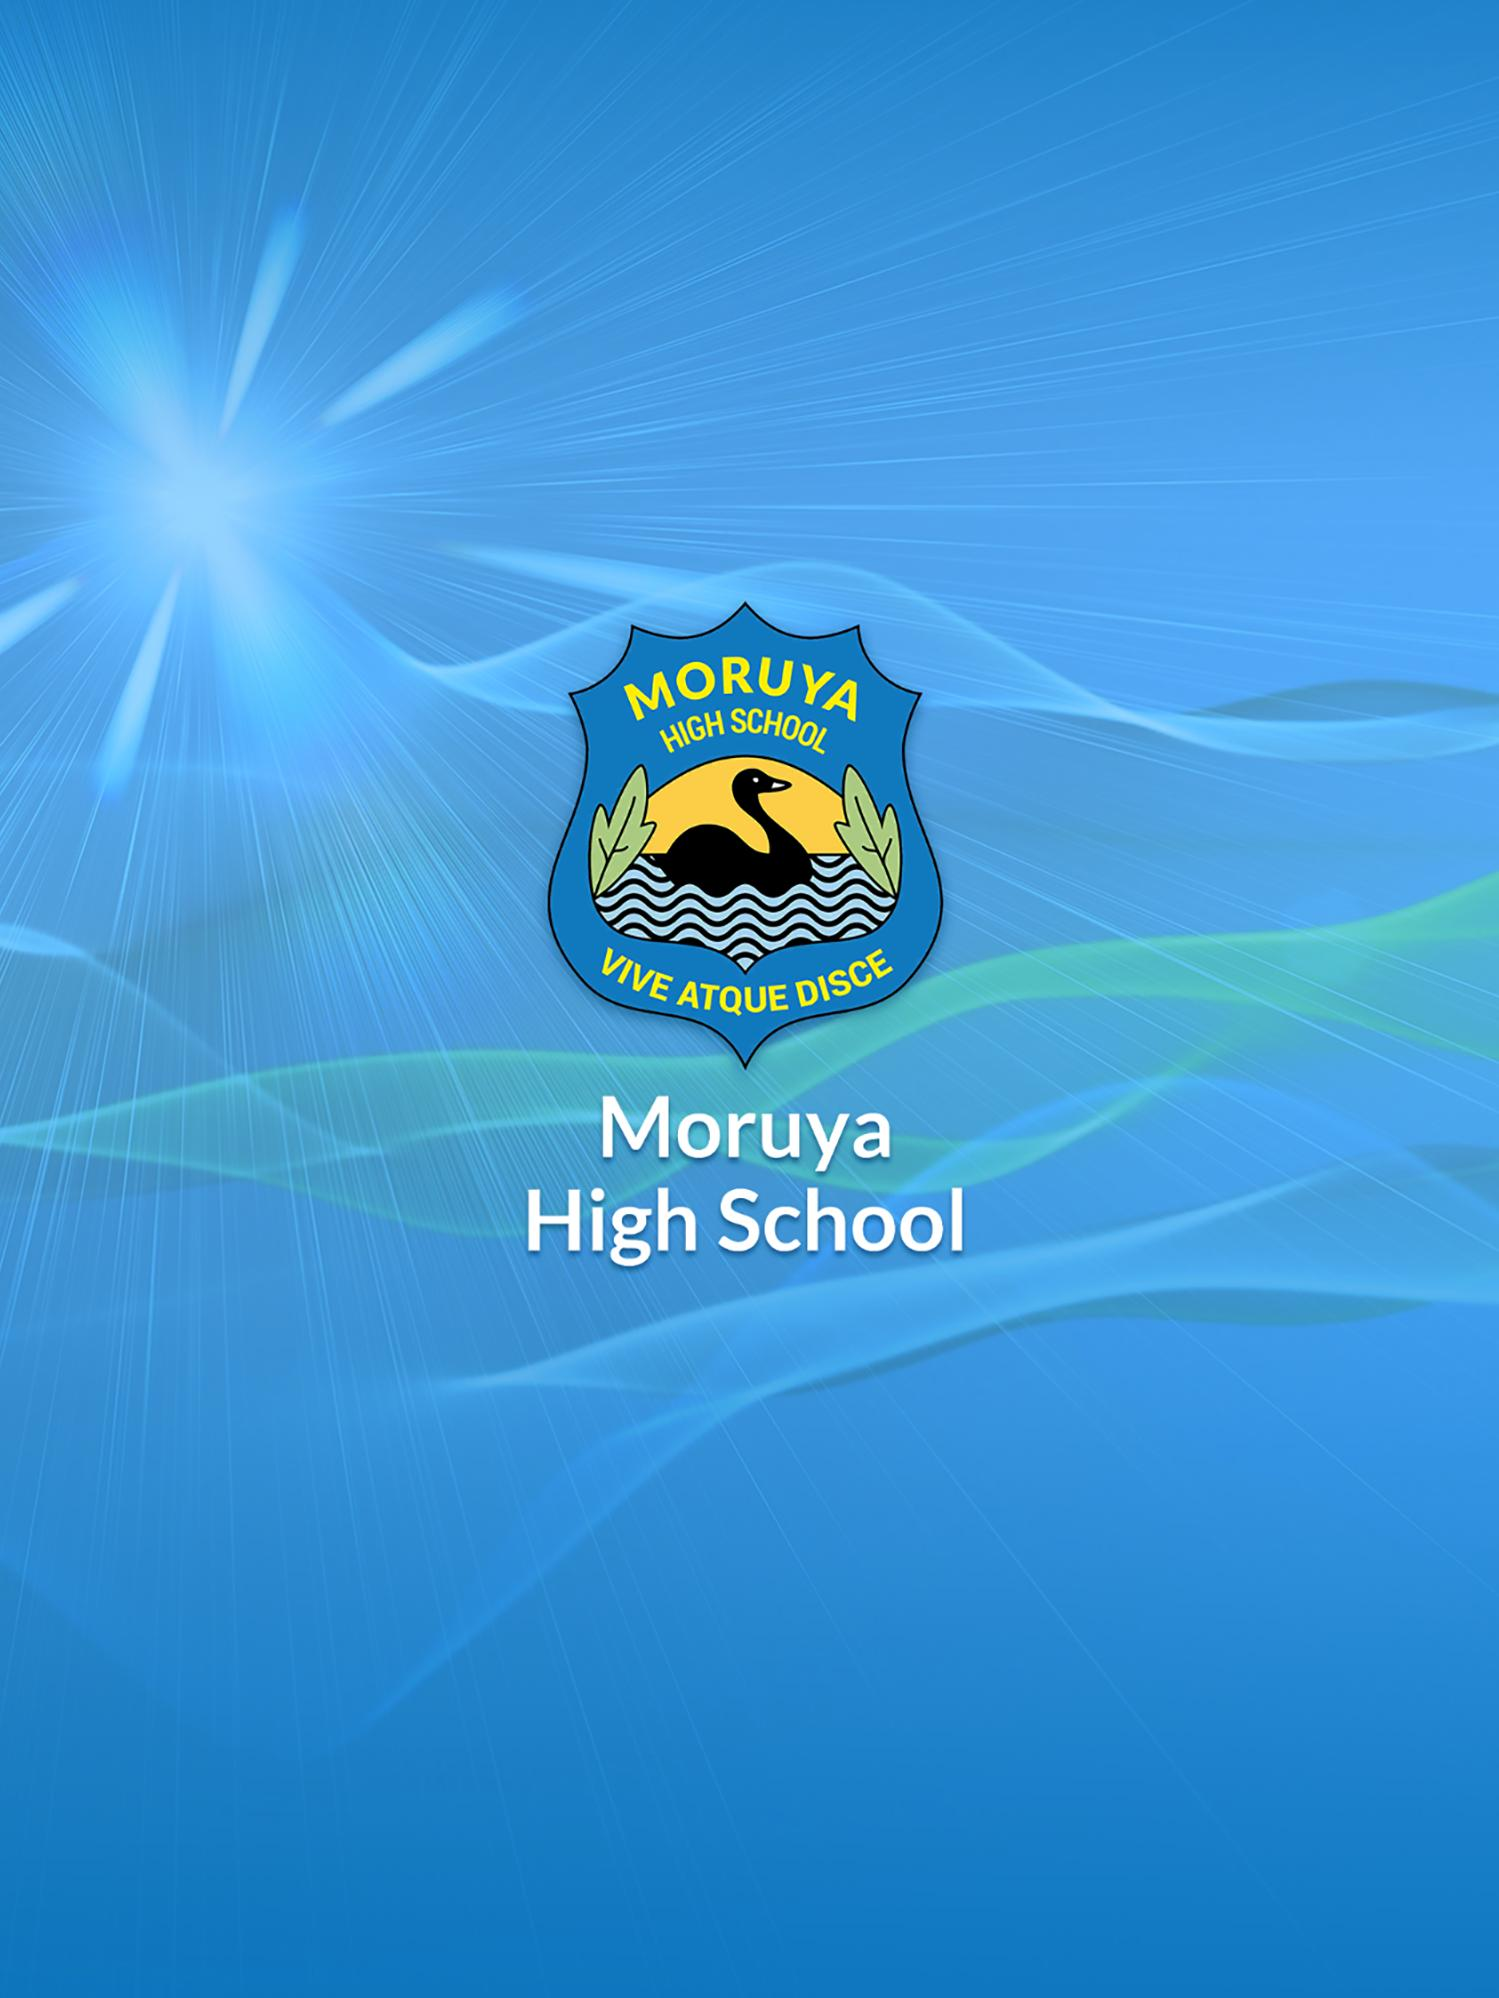 Moruya High School poster